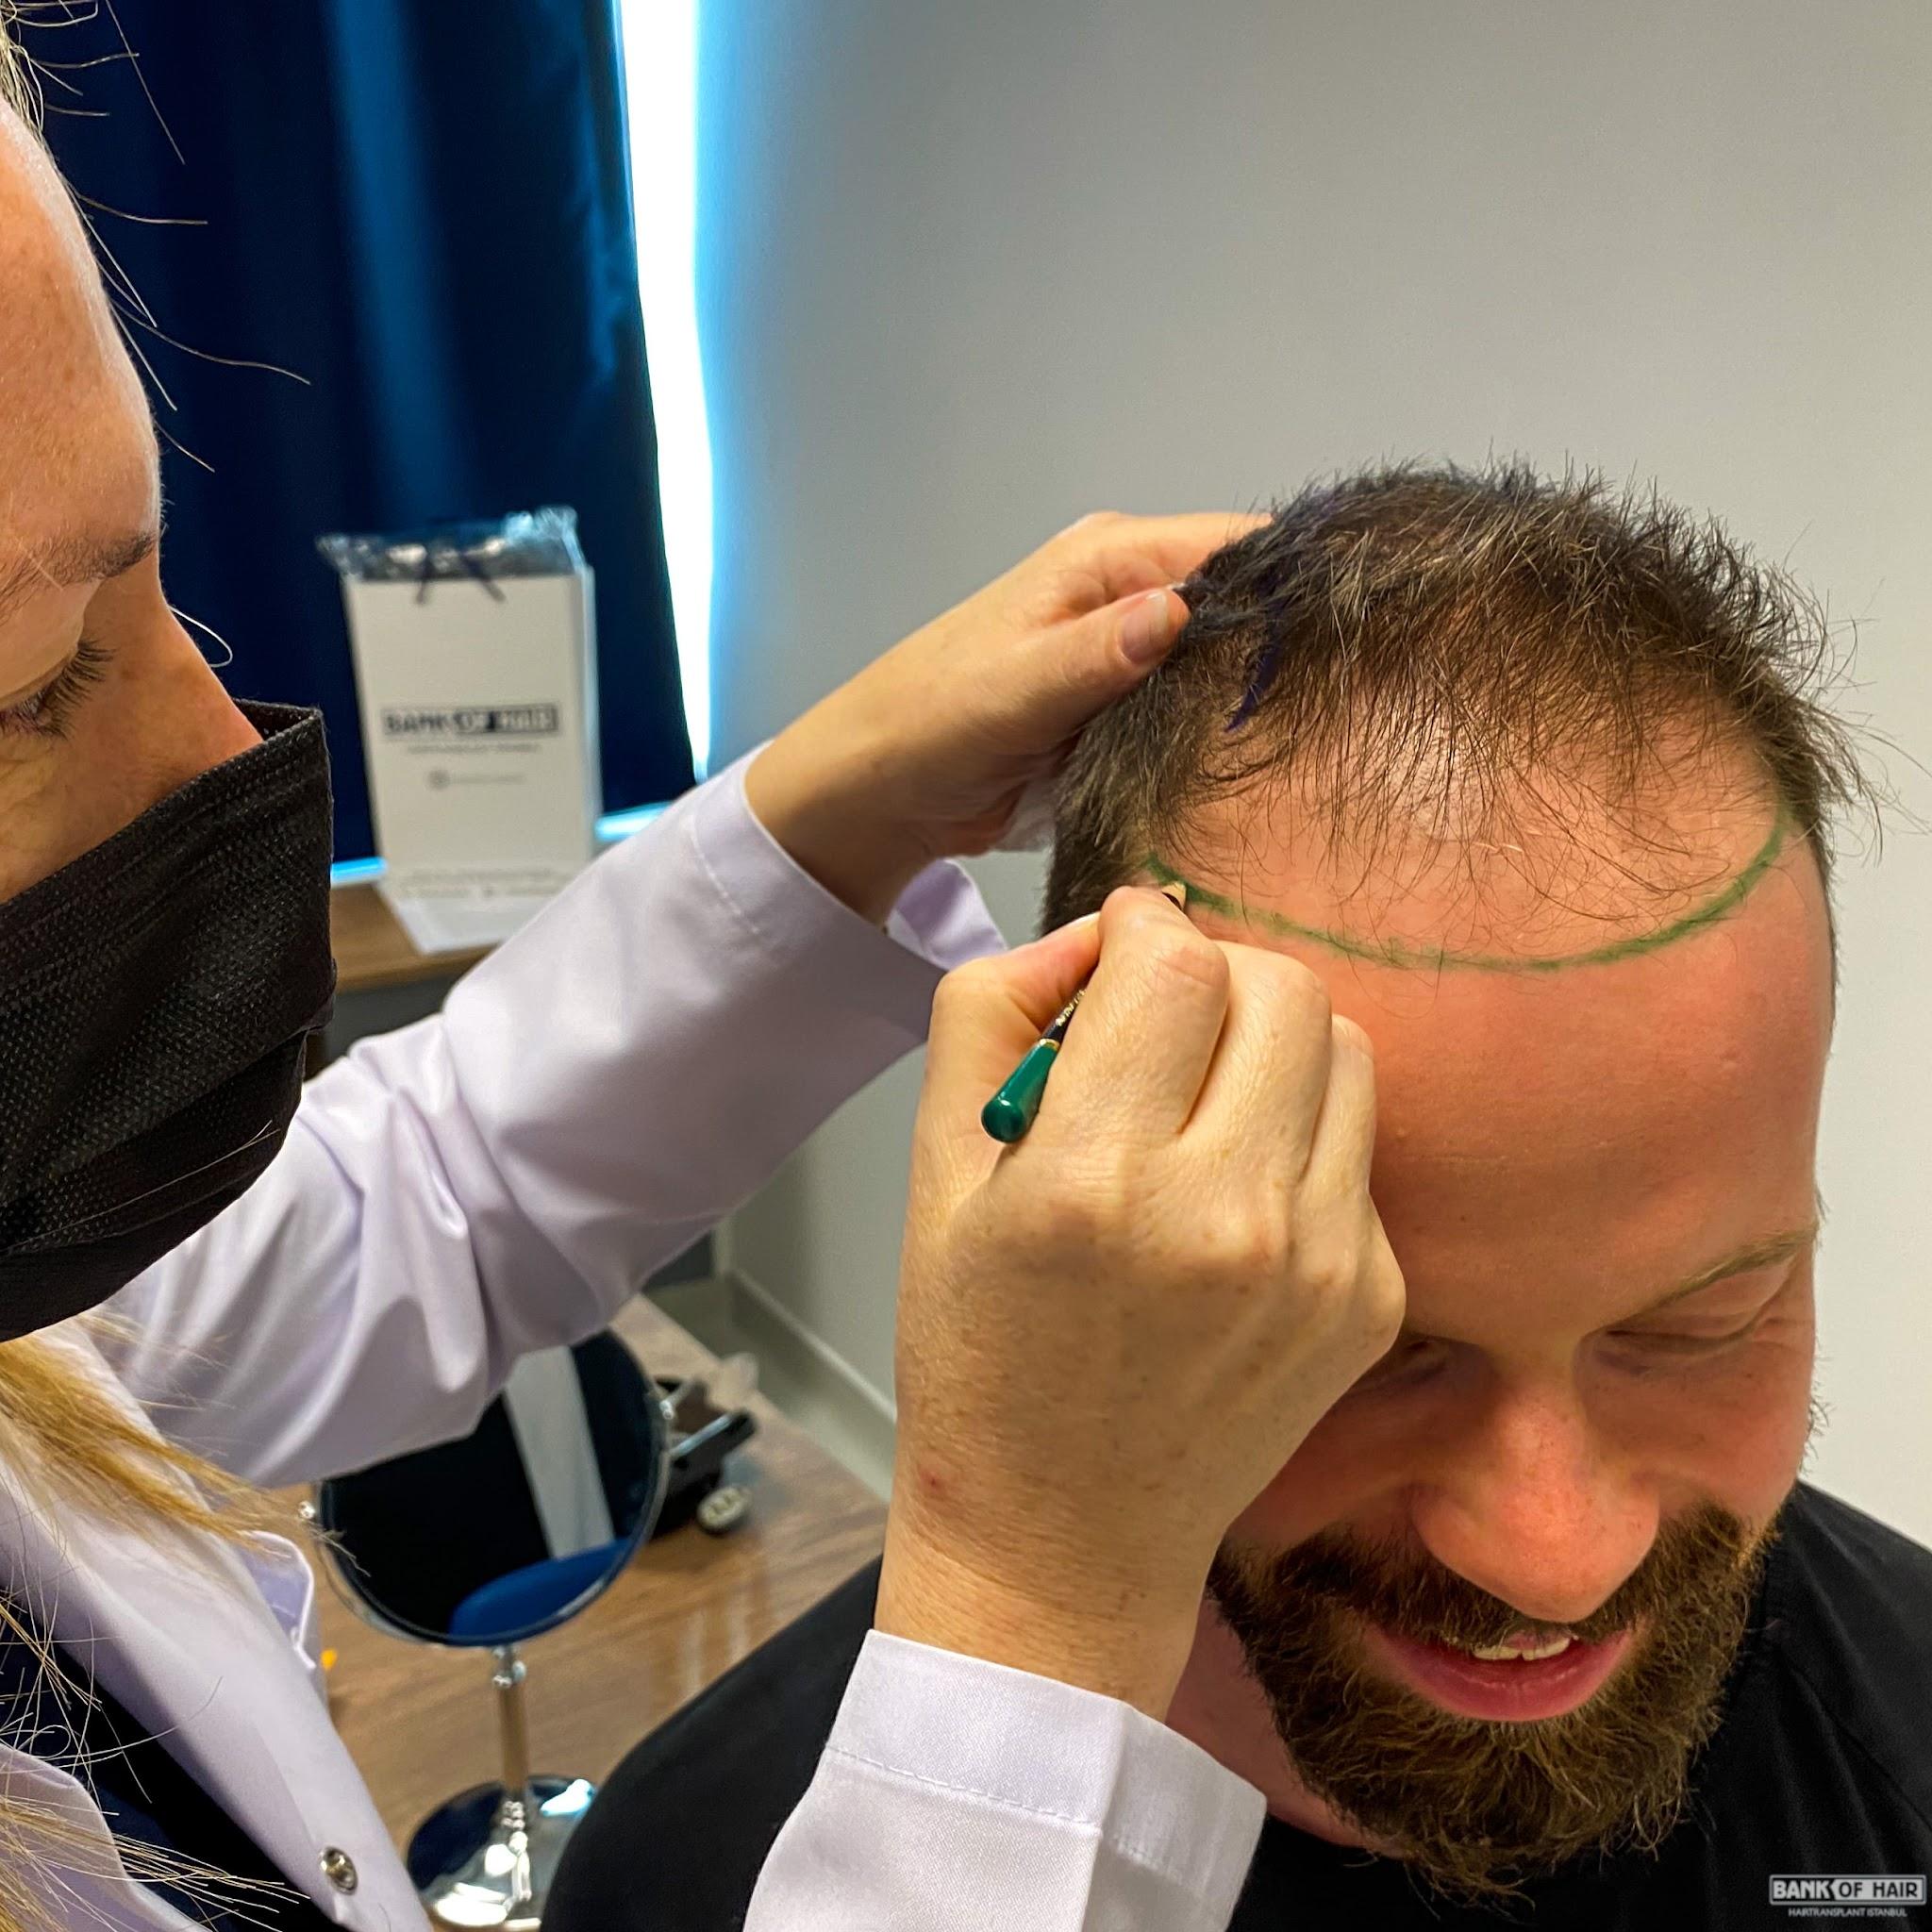 Haartransplantation erfahrungen Bart Haartransplantation: